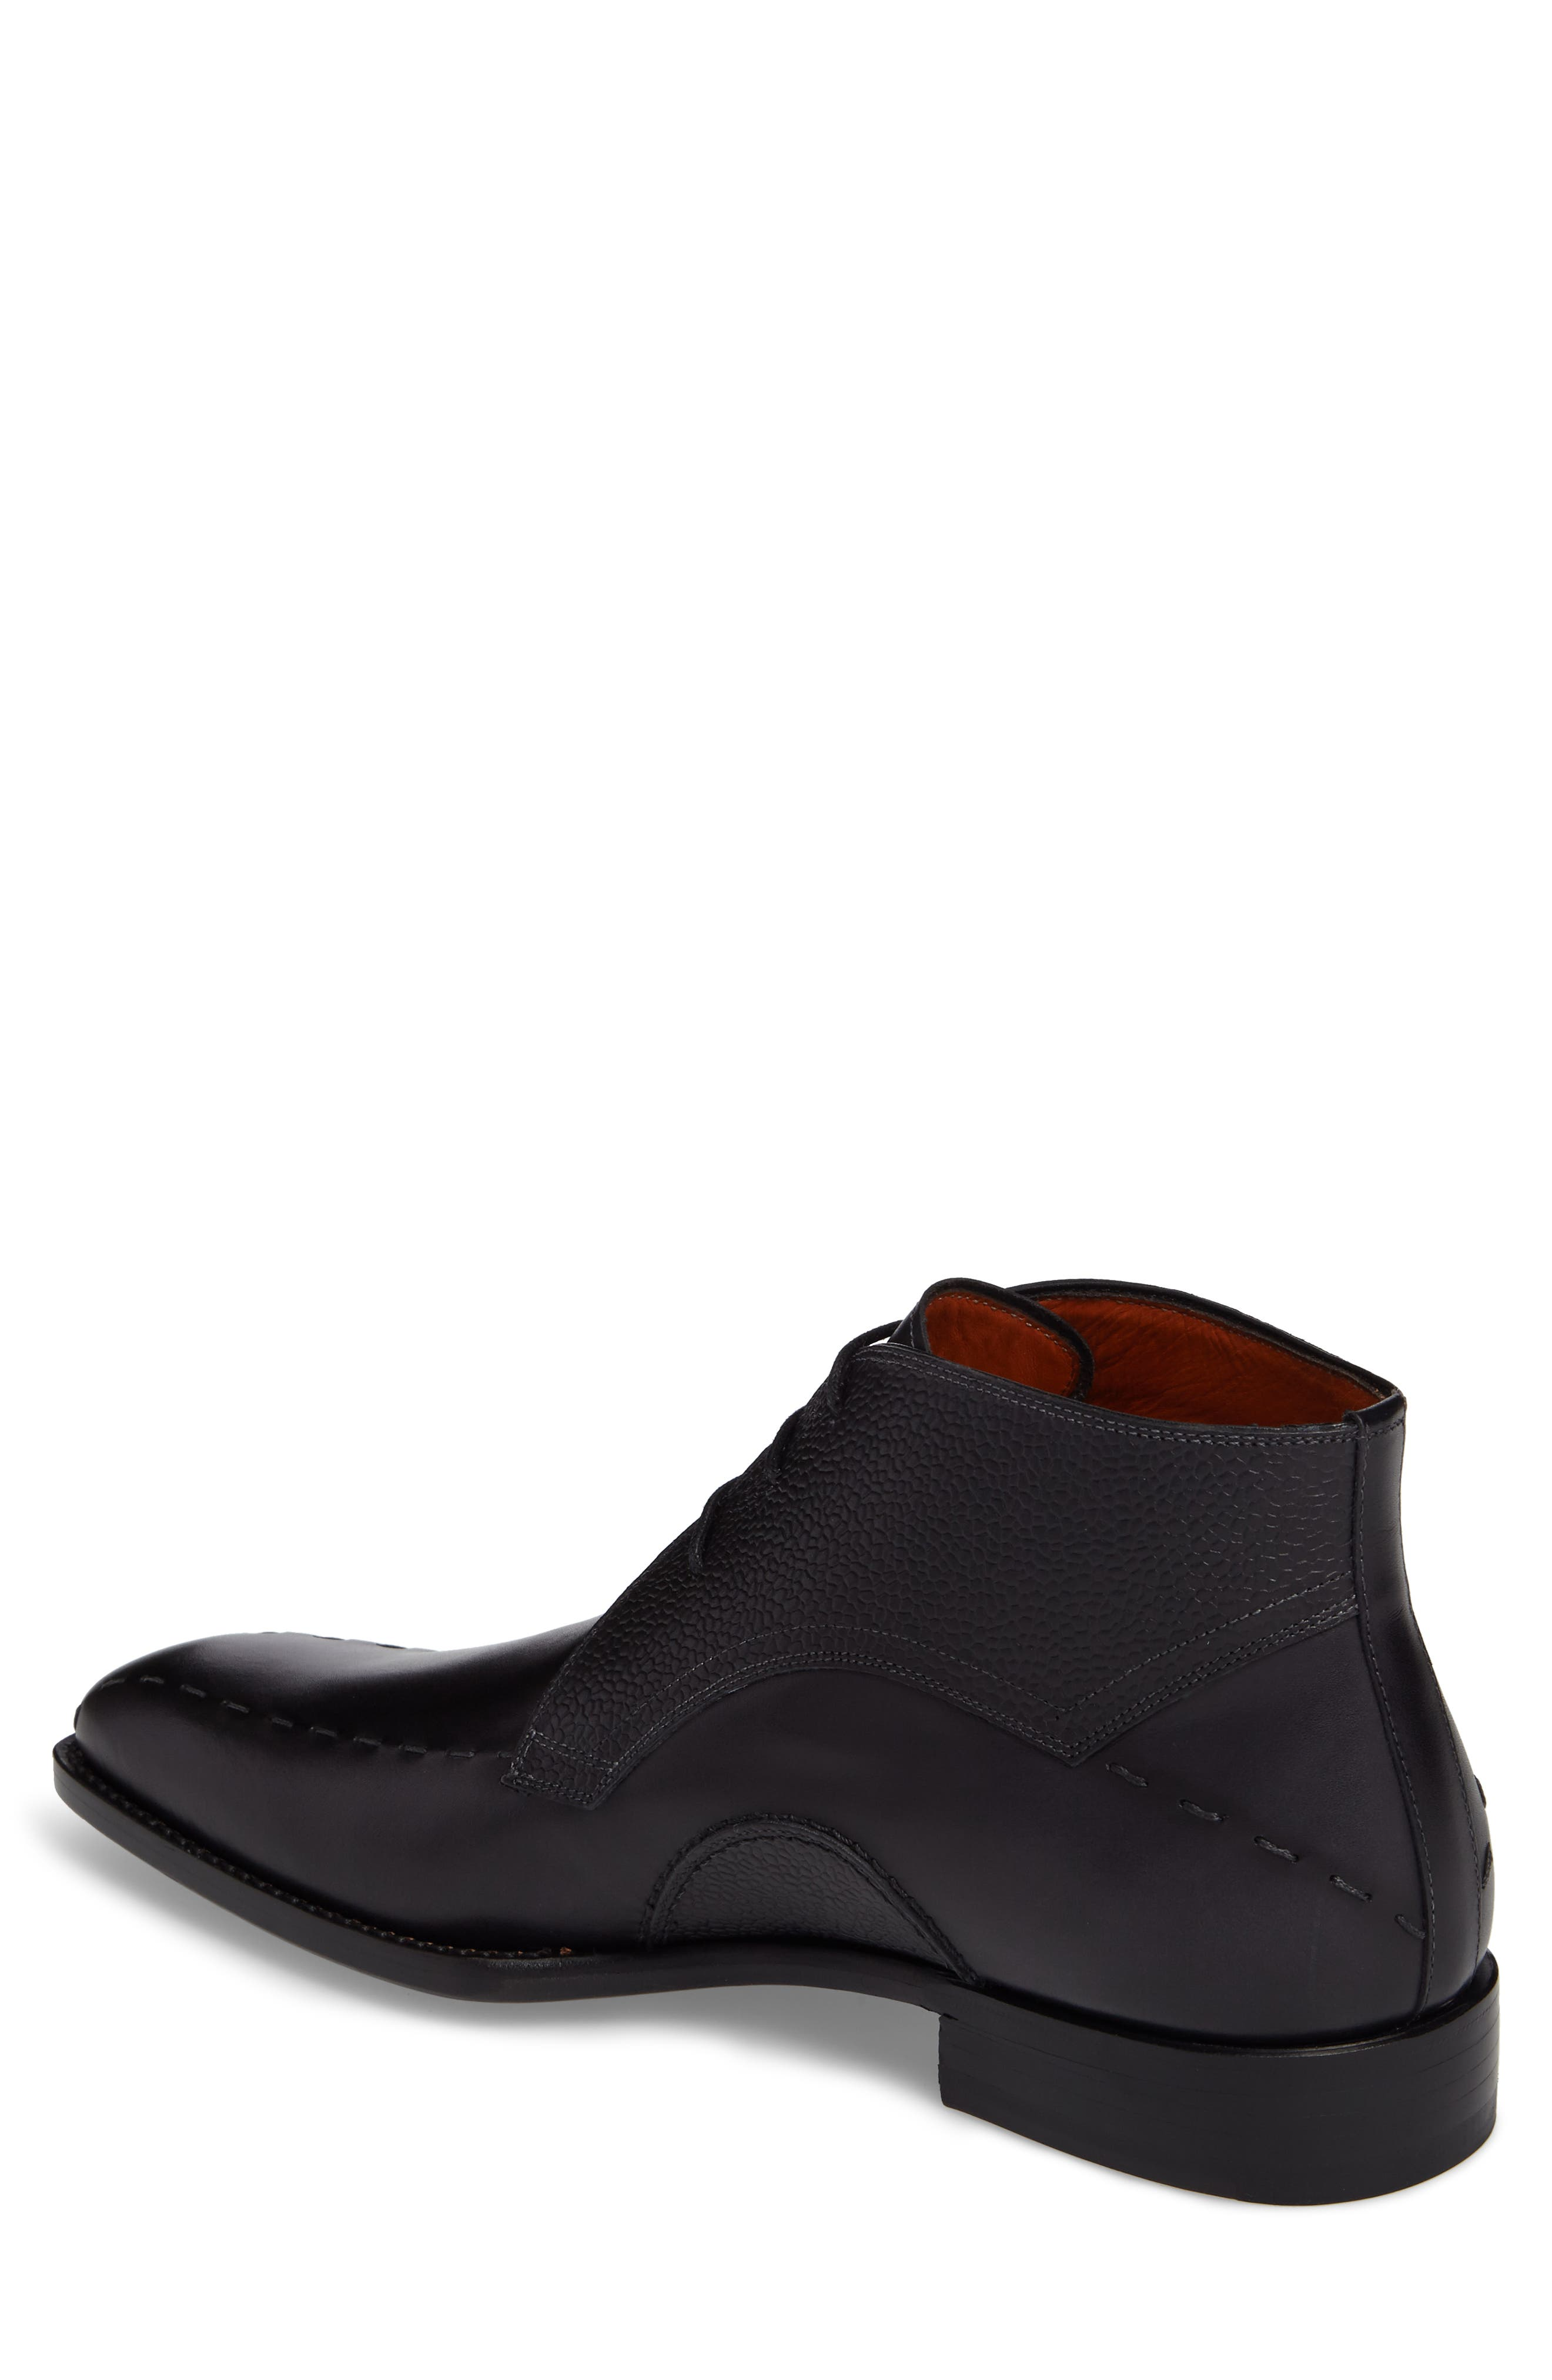 Moriles Chukka Boot,                             Alternate thumbnail 2, color,                             Black Leather